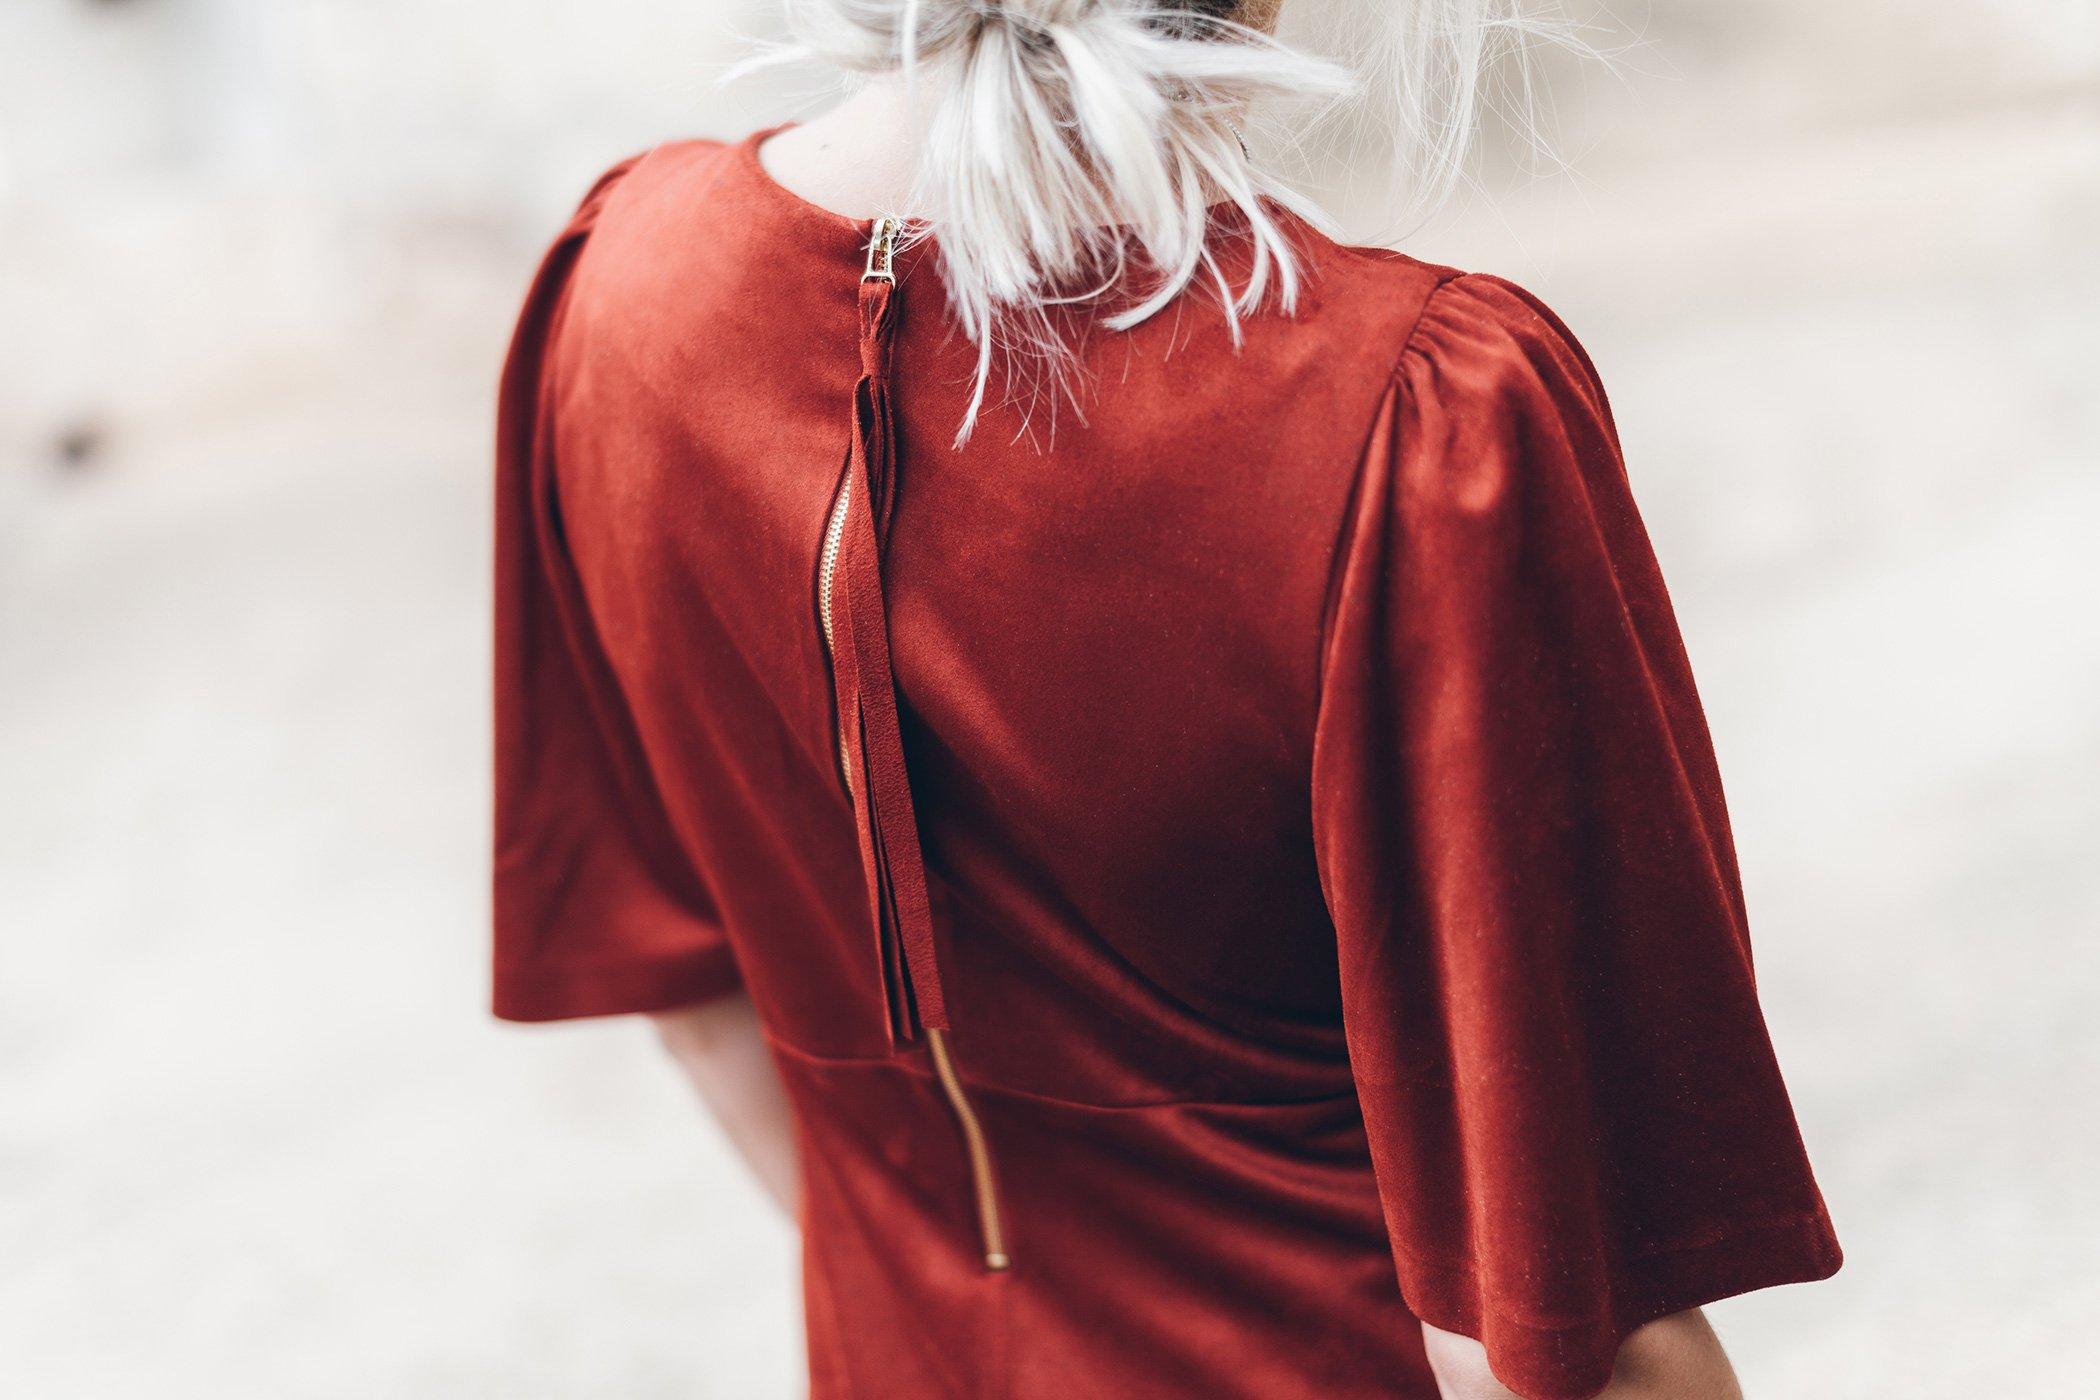 mikuta-red-suede-dress-11